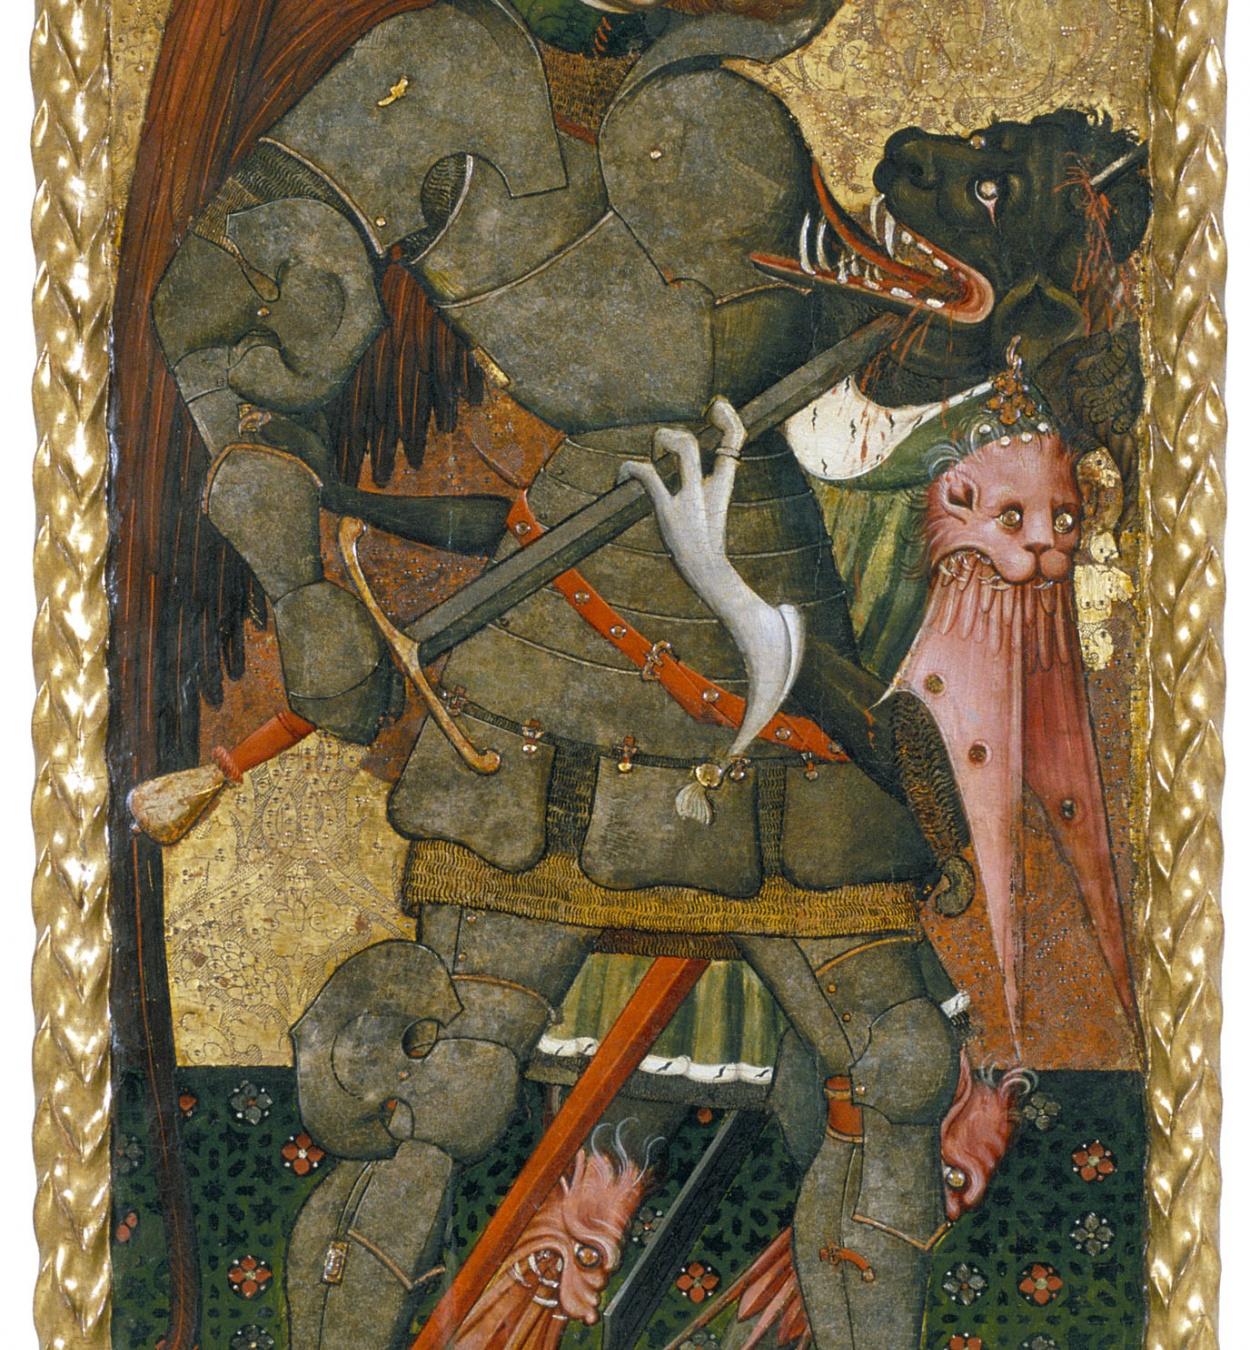 Blasco de Grañén - Sant Miquel Arcàngel - Cap a 1435-1445